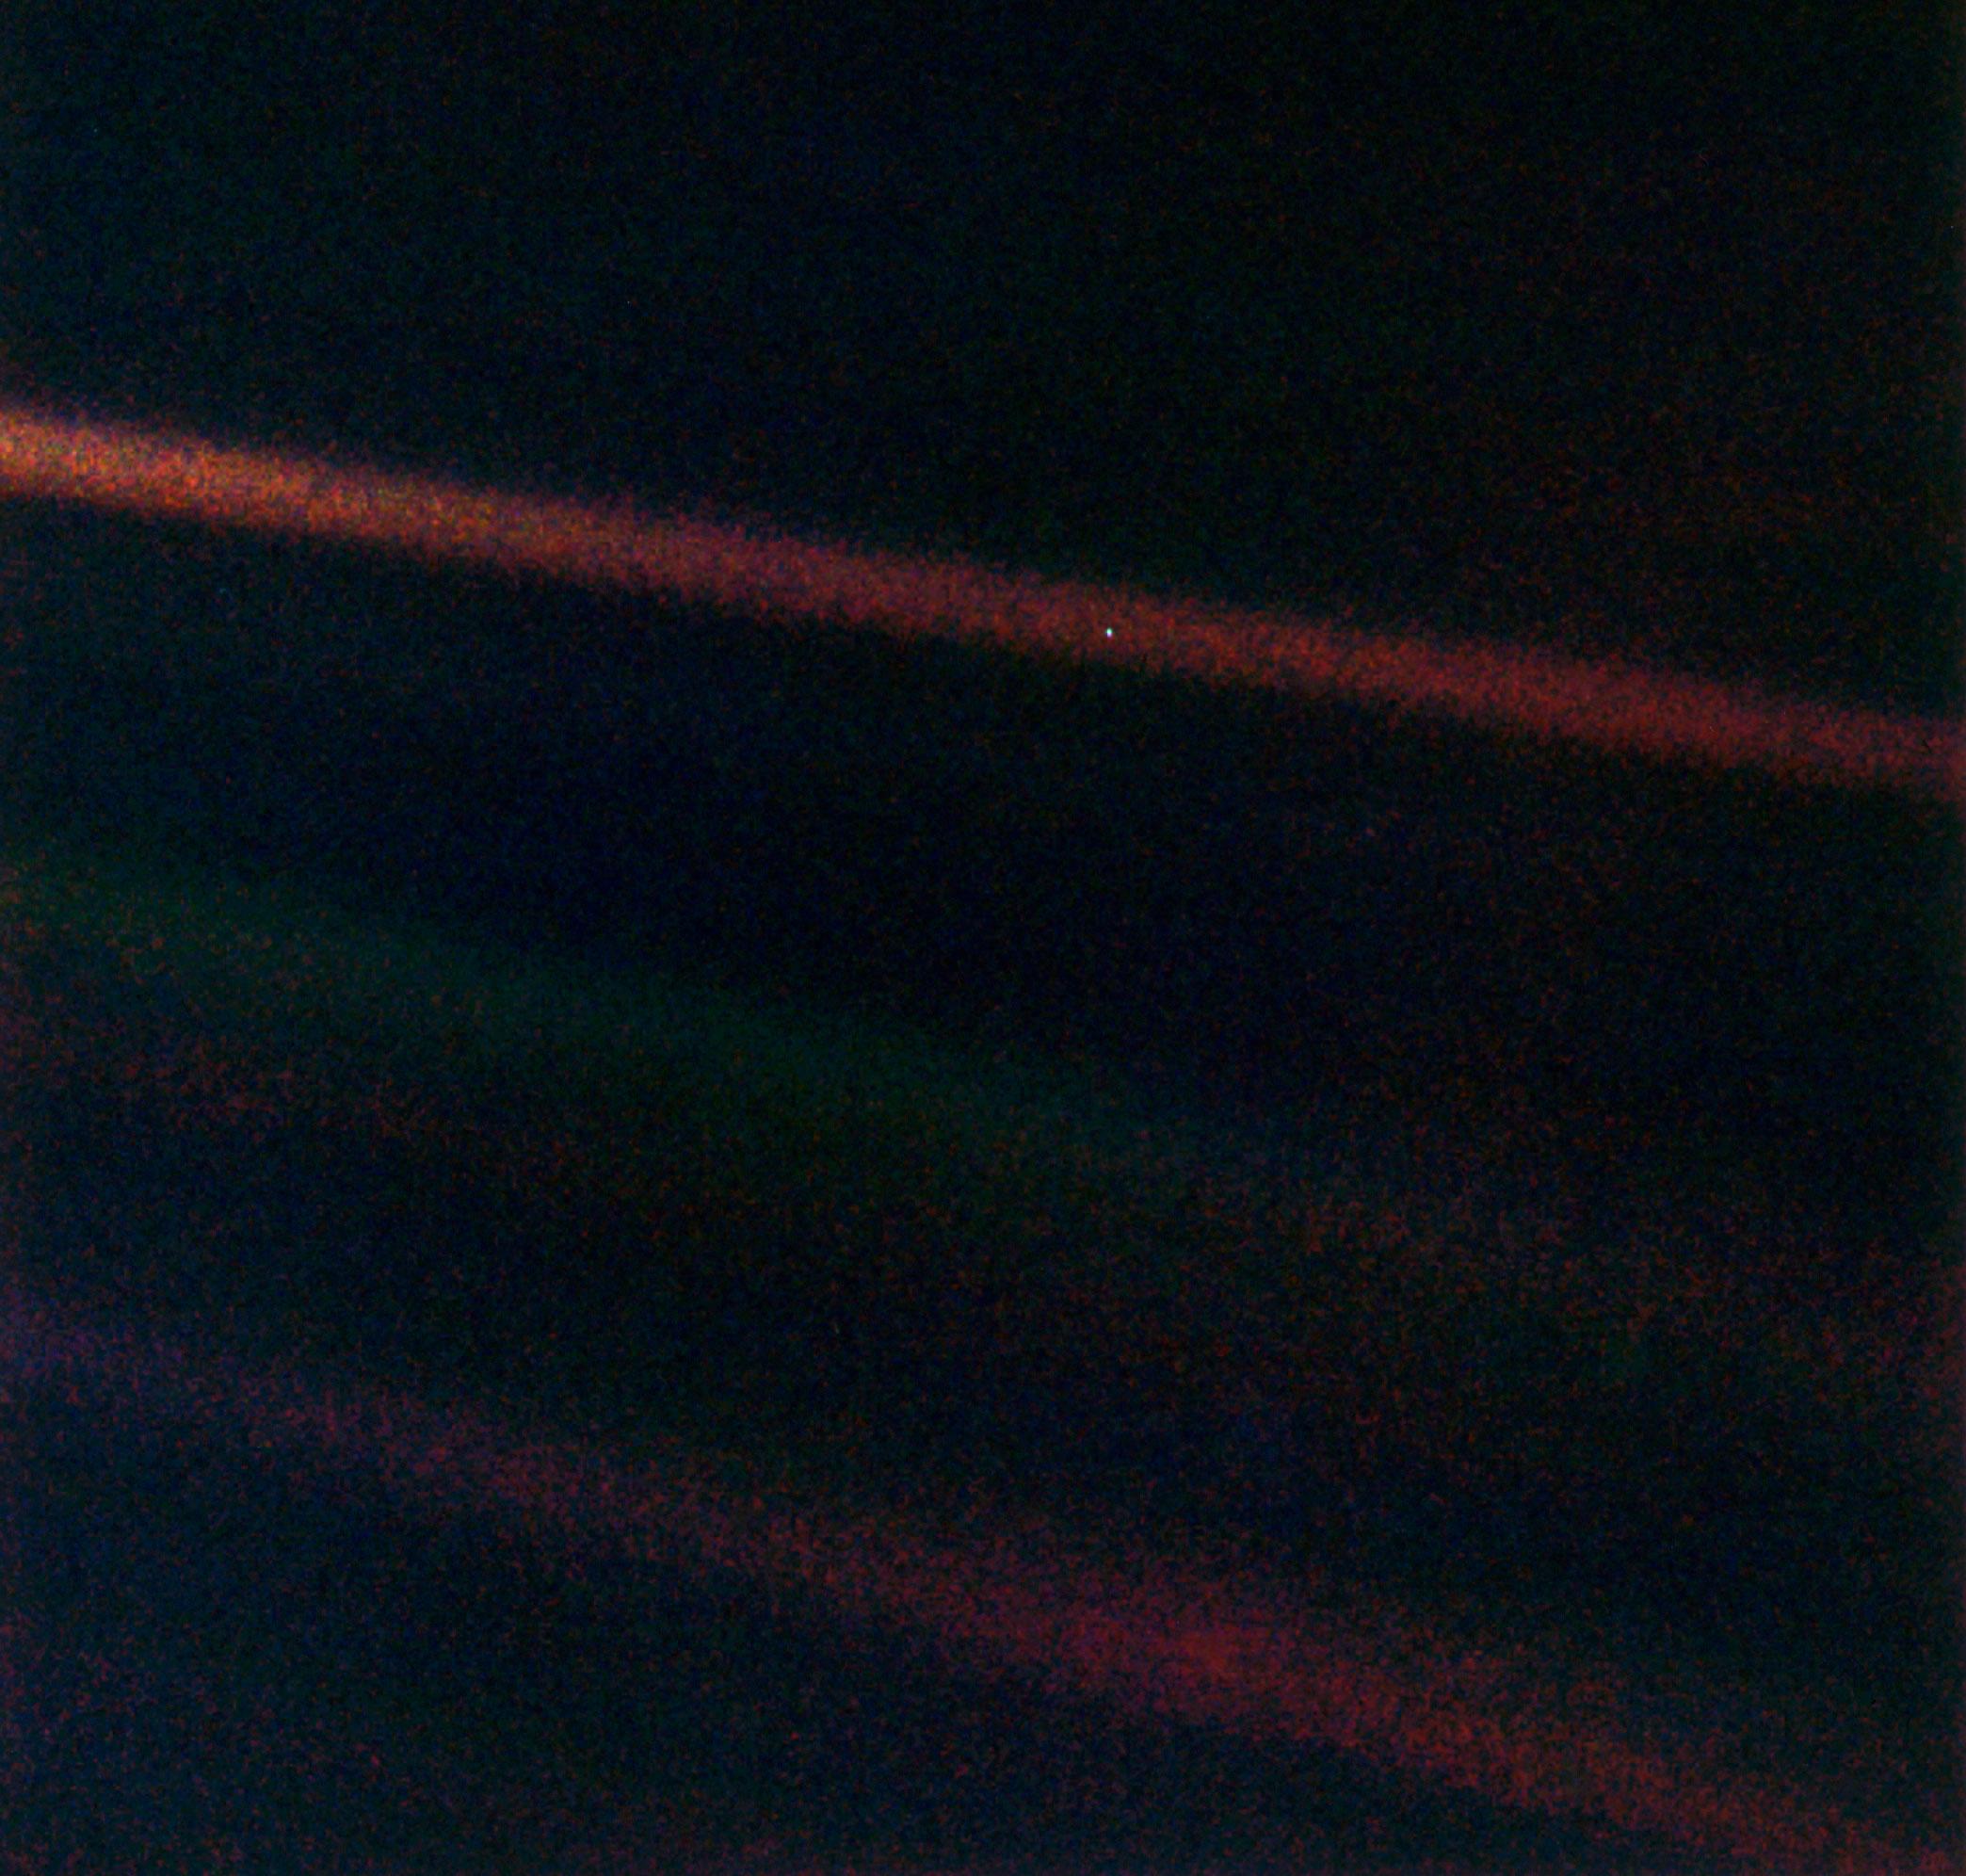 Pale Blue Dot Wallpaper - WallpaperSafari